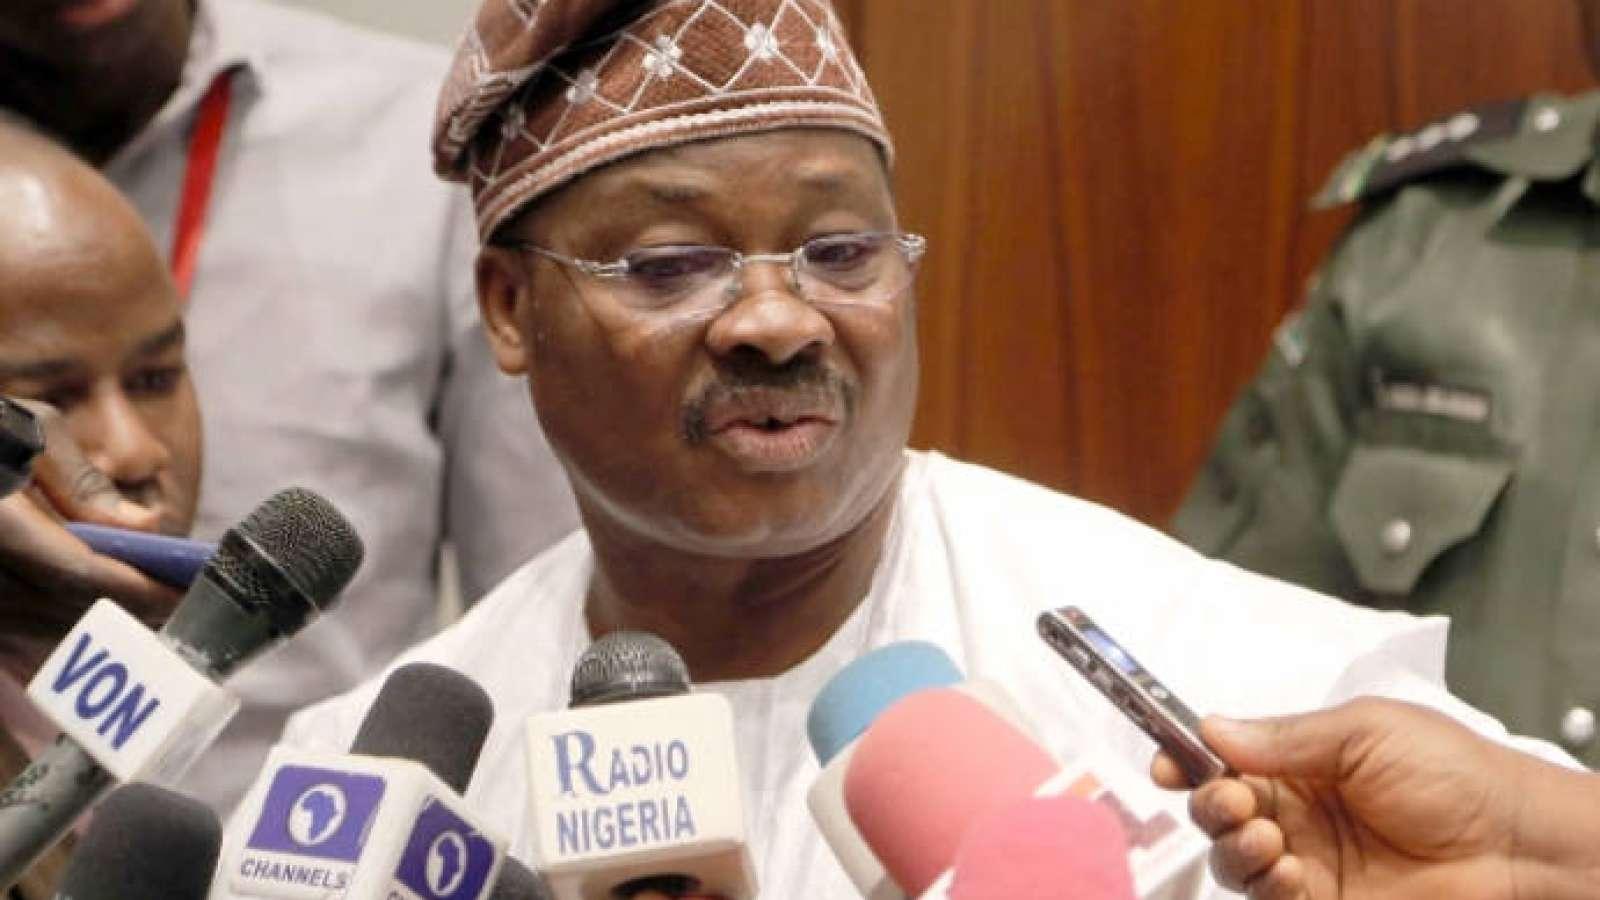 """If We Have Stolen, They Should Arrest Us"" - Governor Ajimobi Speaks On Probe After Tenure 1"